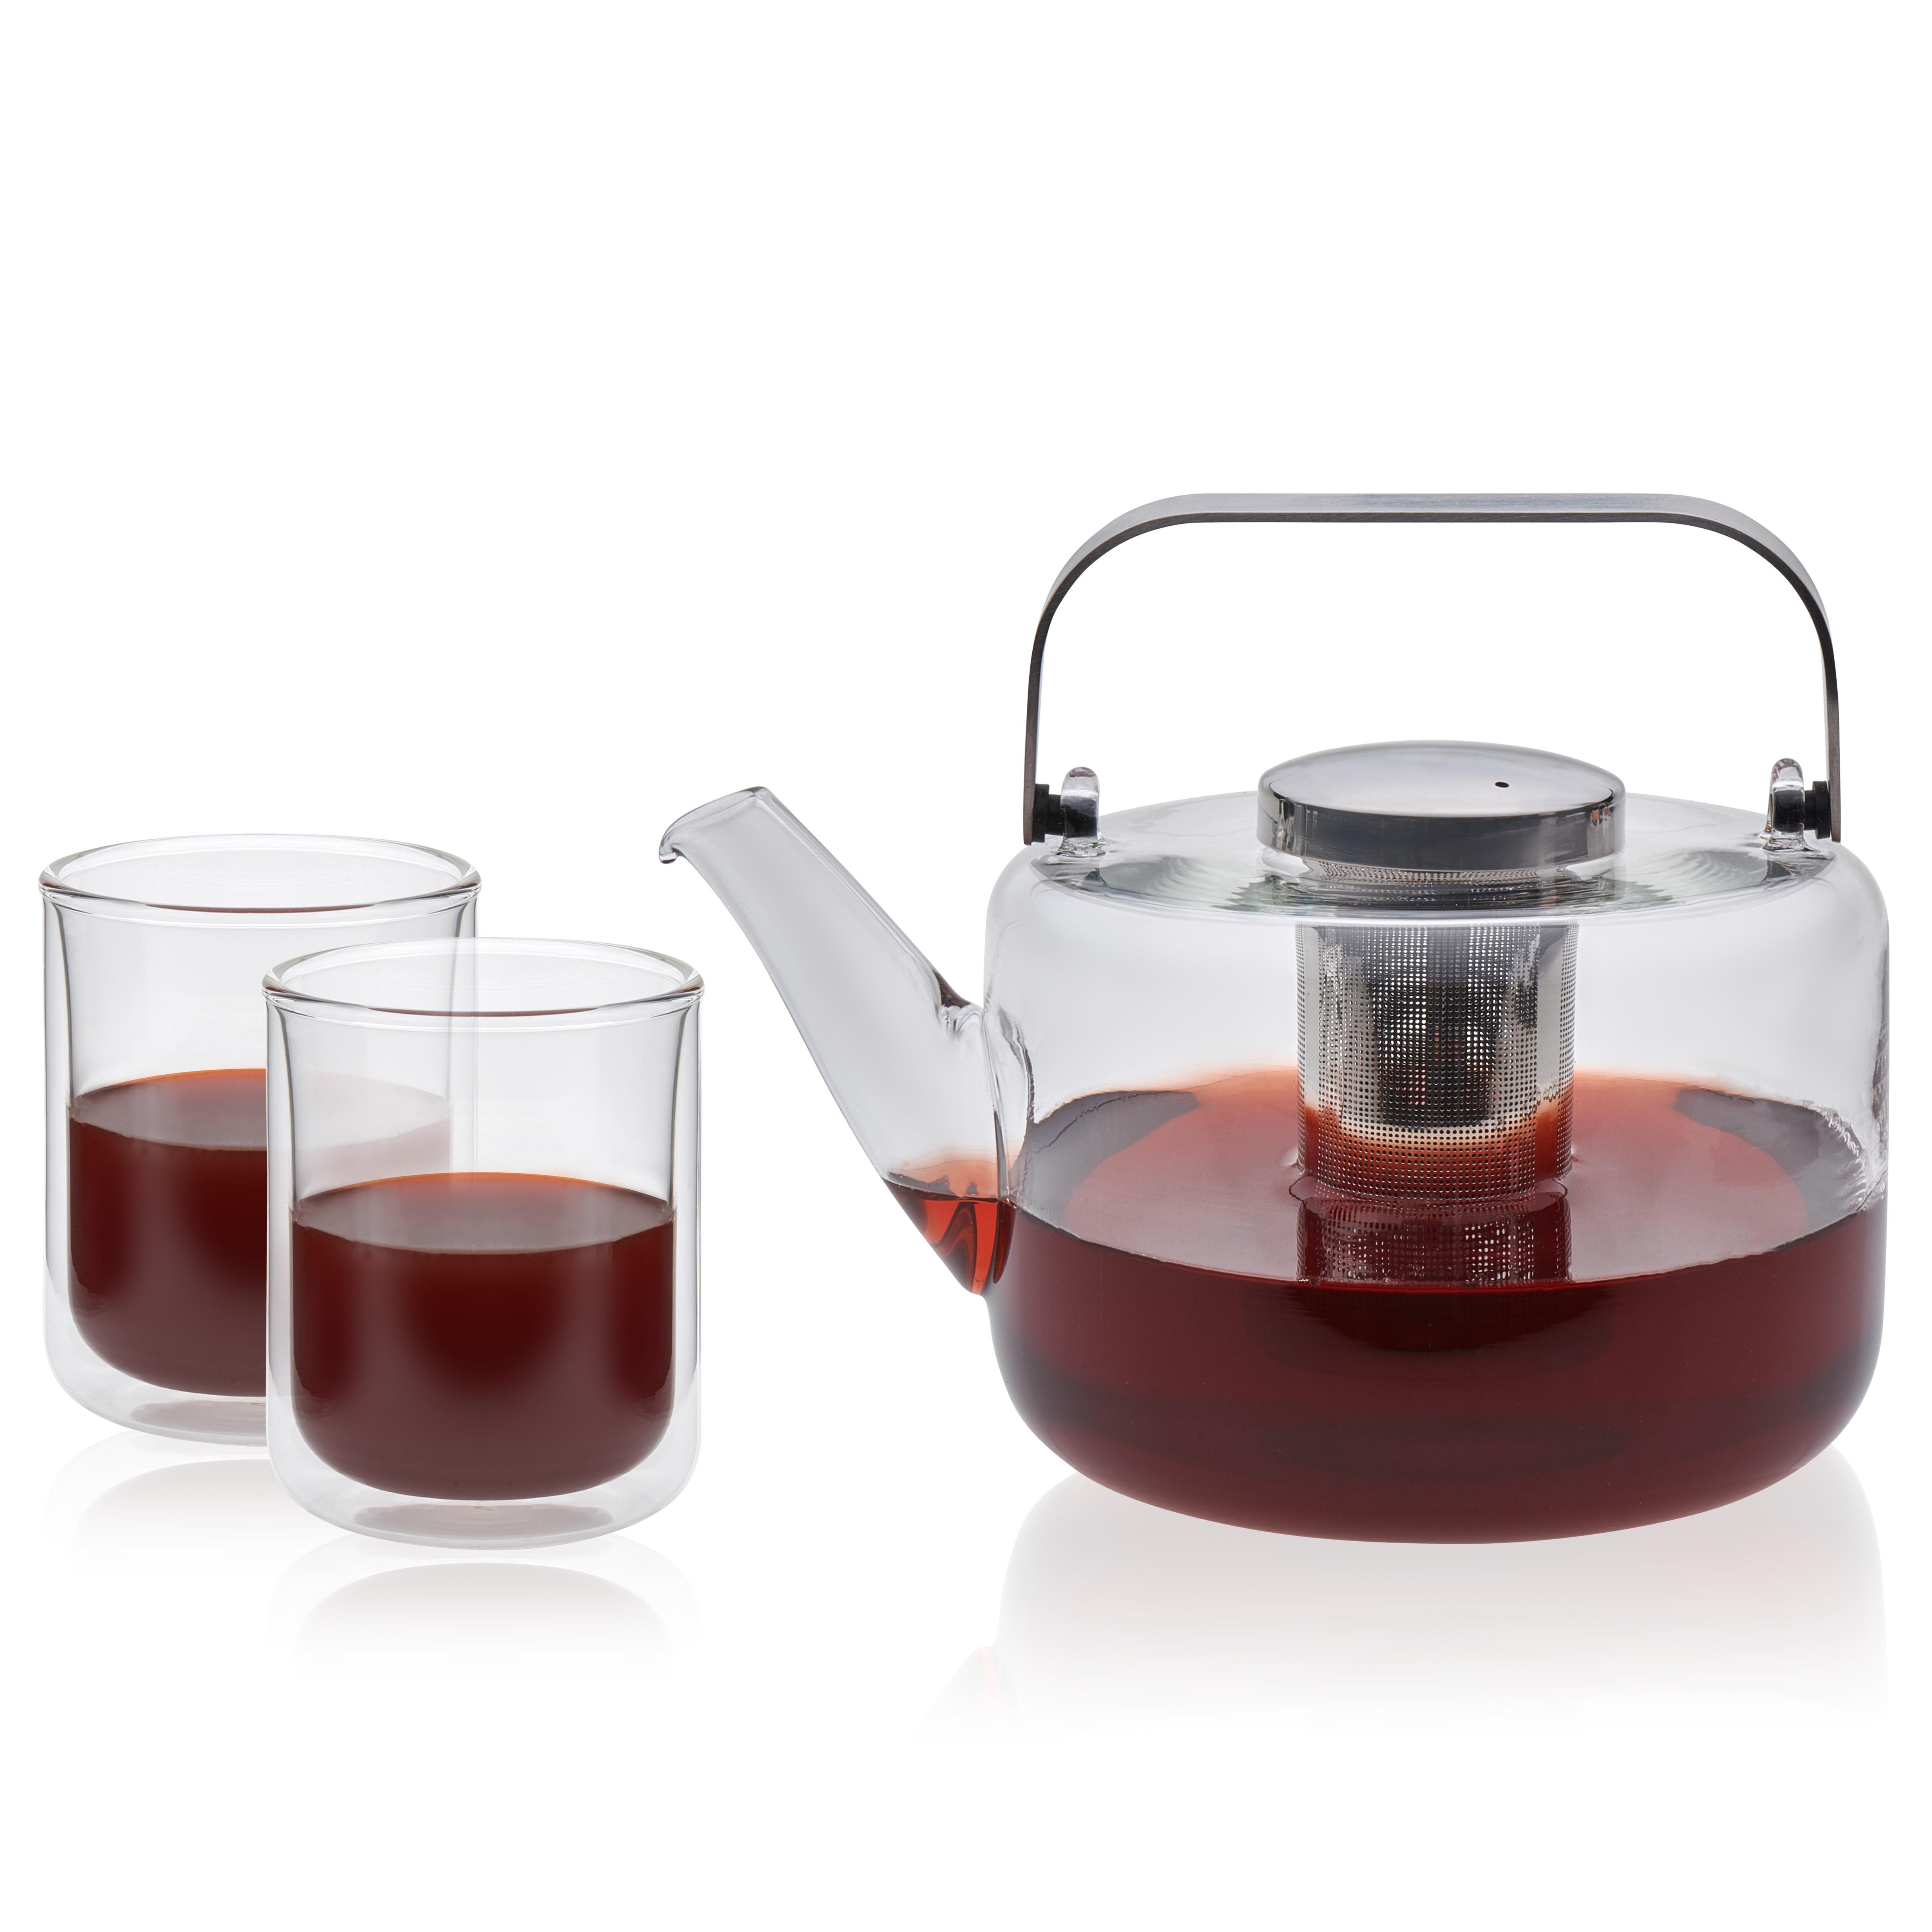 VIVA Scandinavia Bjorn Glass Teapot and Classic Double Walled Glass Drinkware Set, 11.7-ounce Tea Glasses & 44-ounce Glass Teapot, Borosilicate (Set of 3)